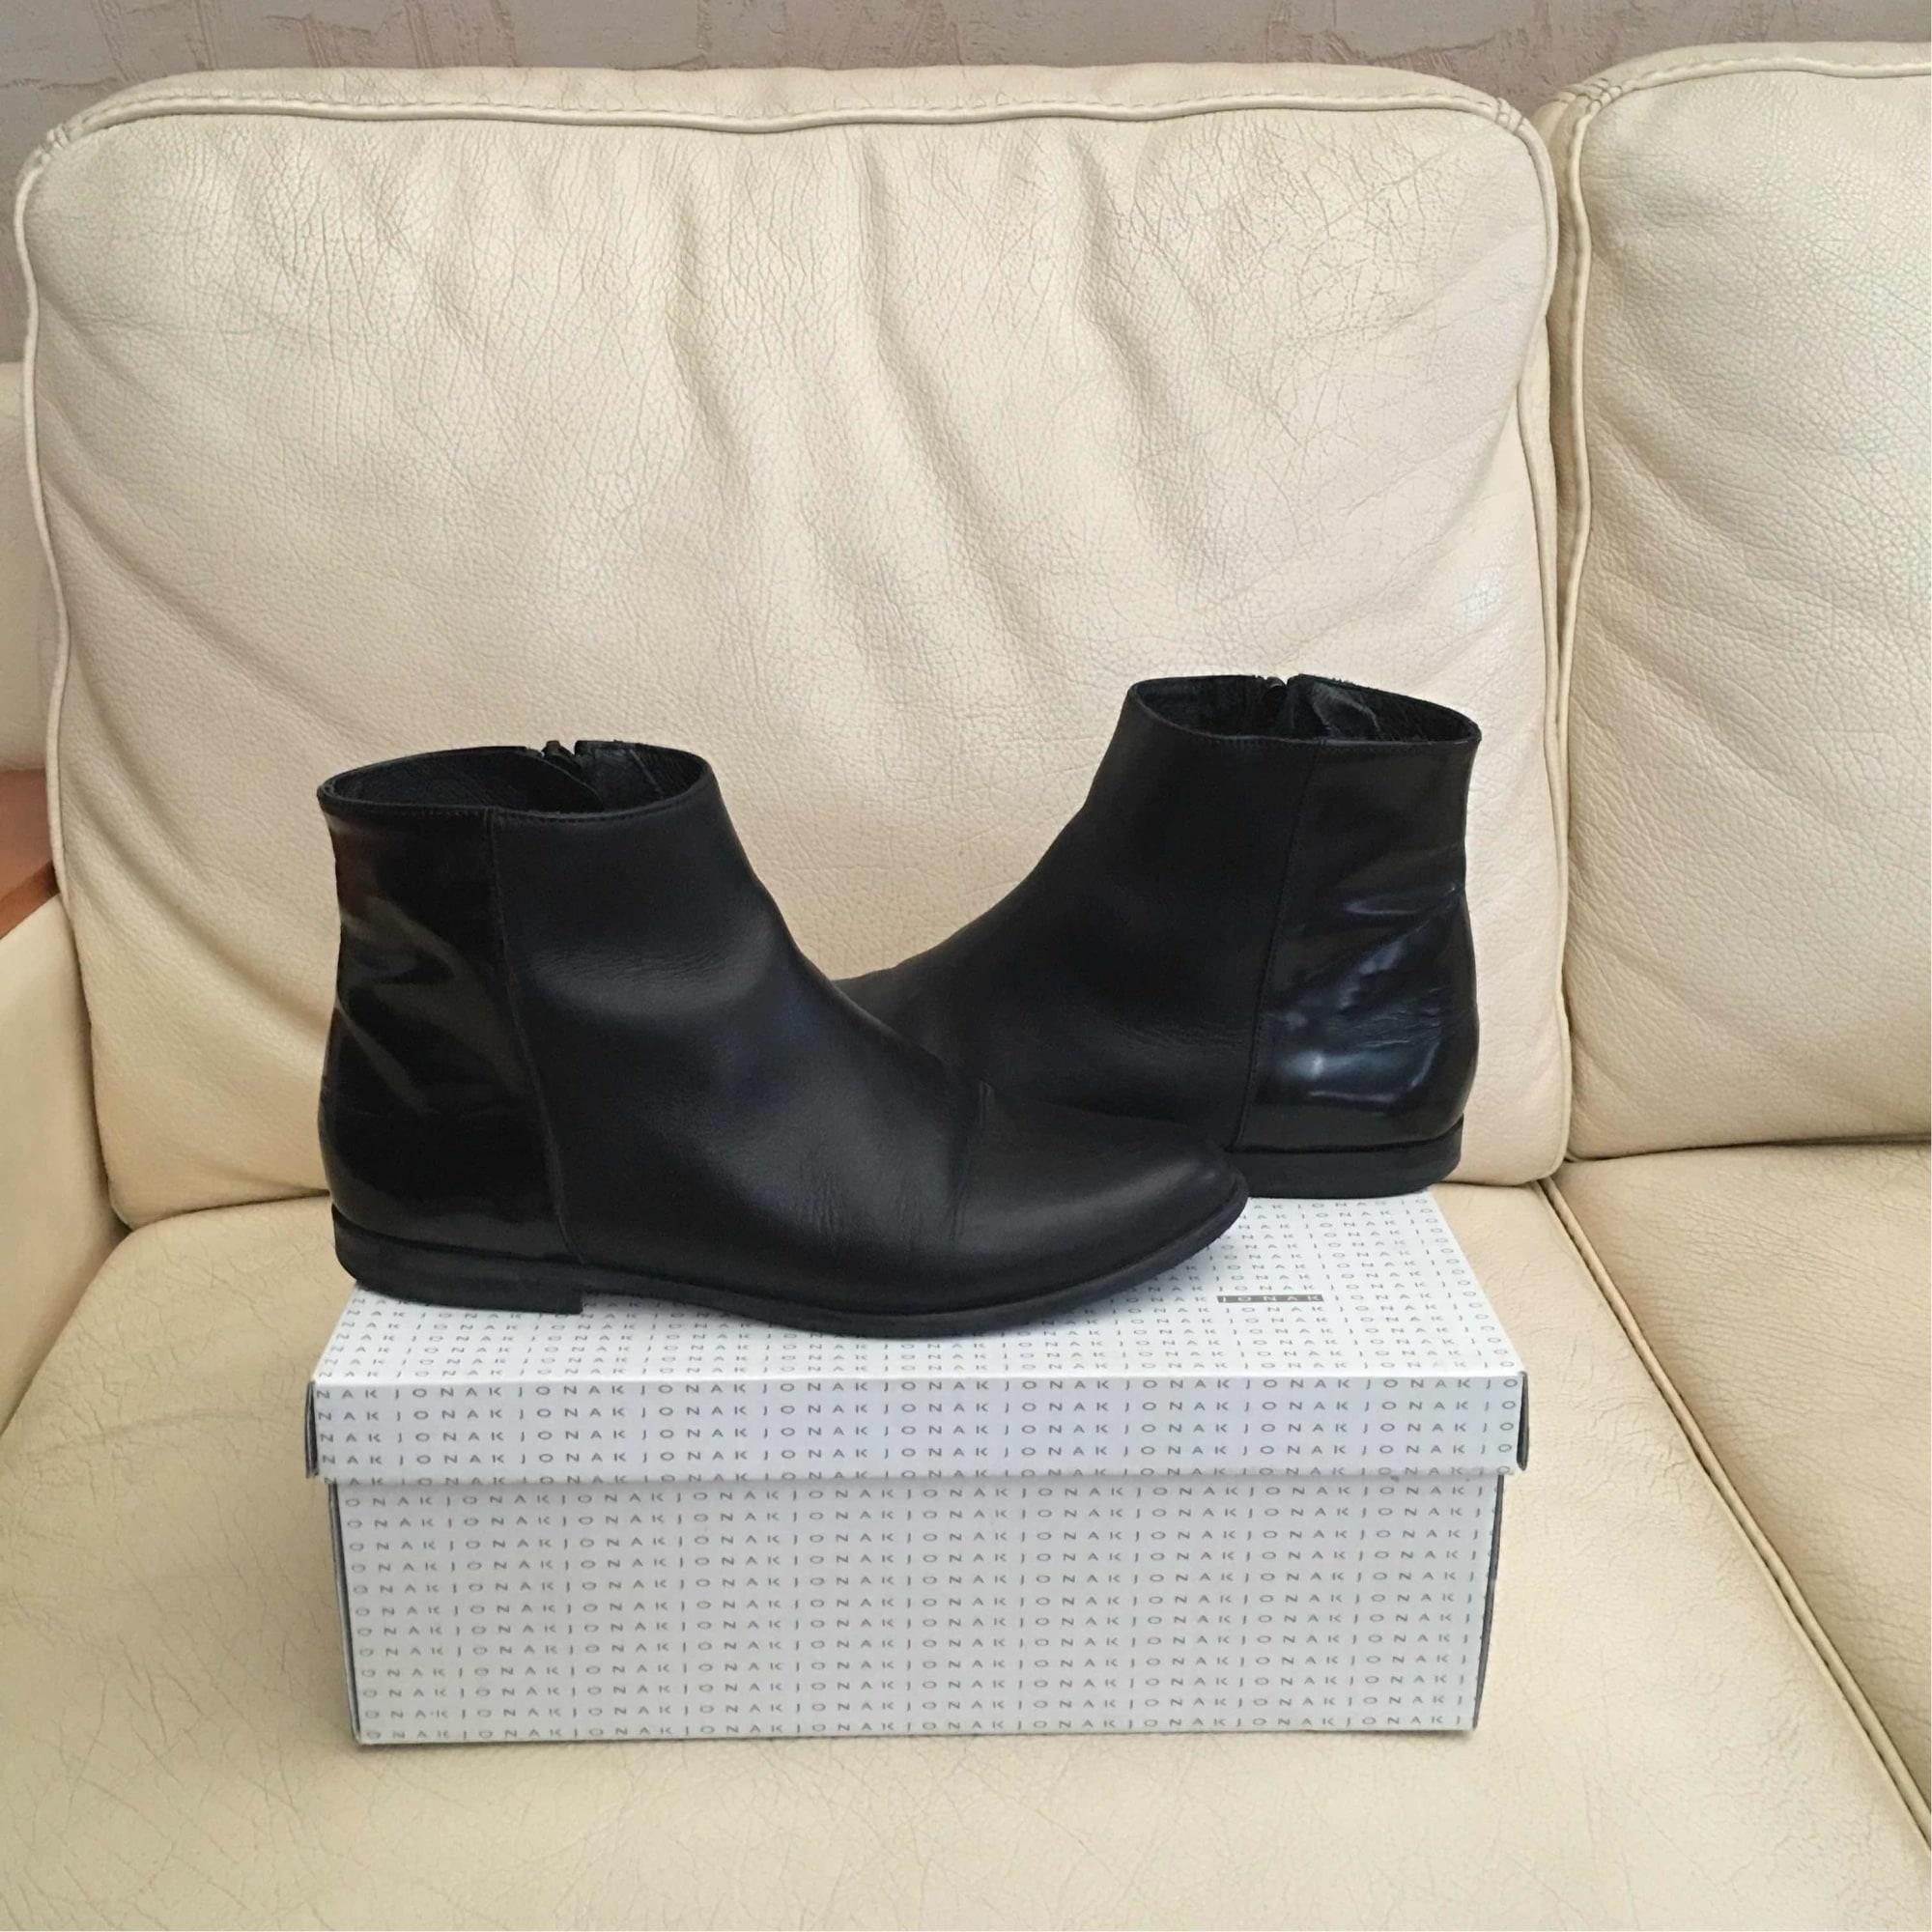 6b3113cd80c Bottines   low boots plates JONAK 38 noir vendu par Chacha chou ...